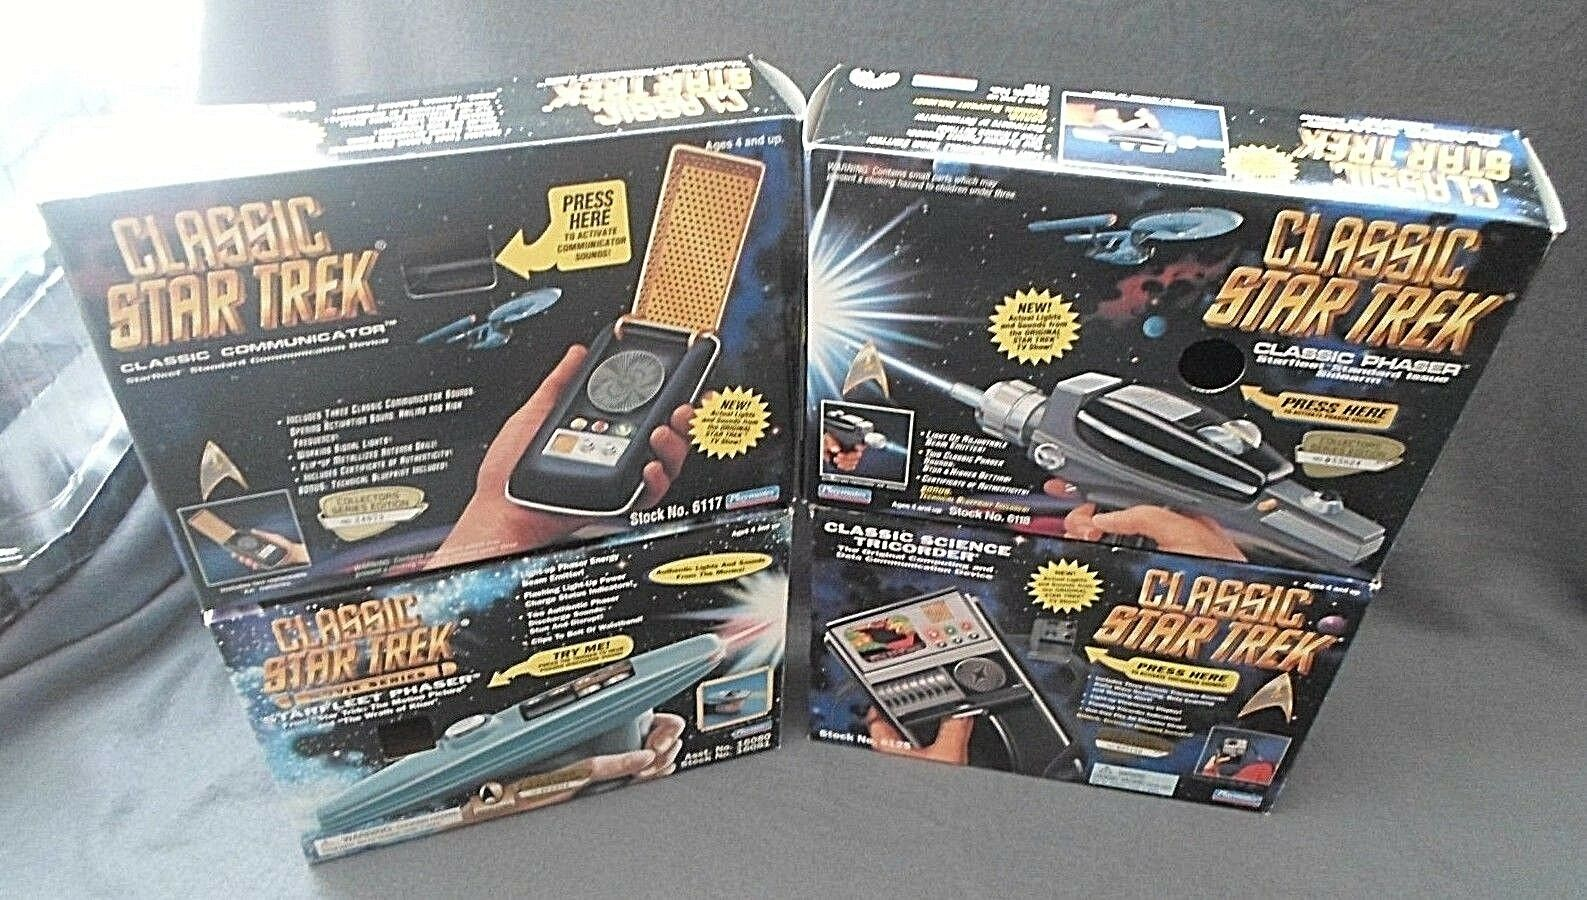 Playmates Star Trek Lot of 4 Phaser Tricorder Coummunicator Movie Phaser Cosplay